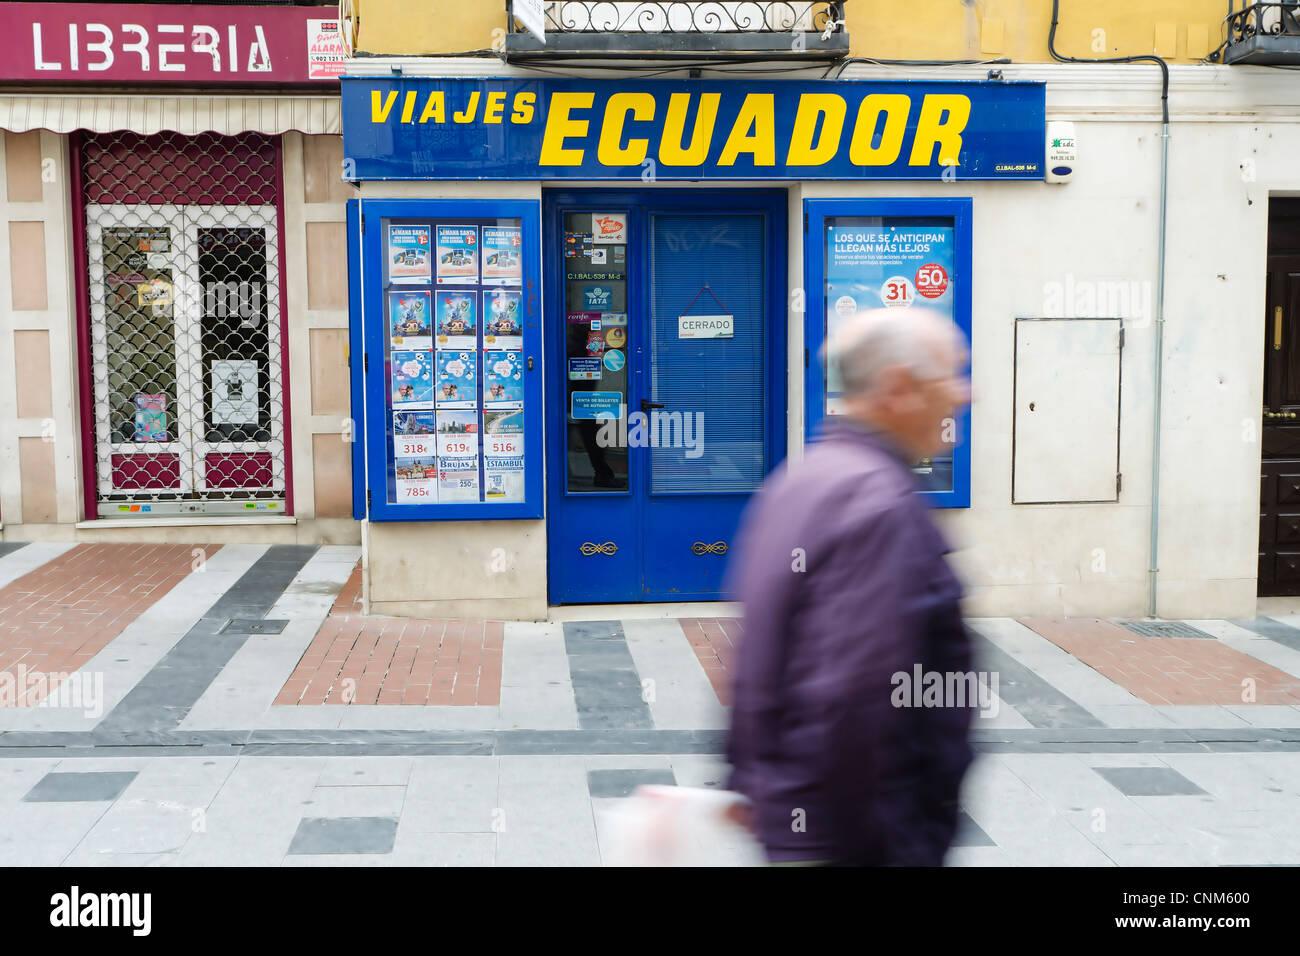 VIAJES ECUADOR - Stock Image